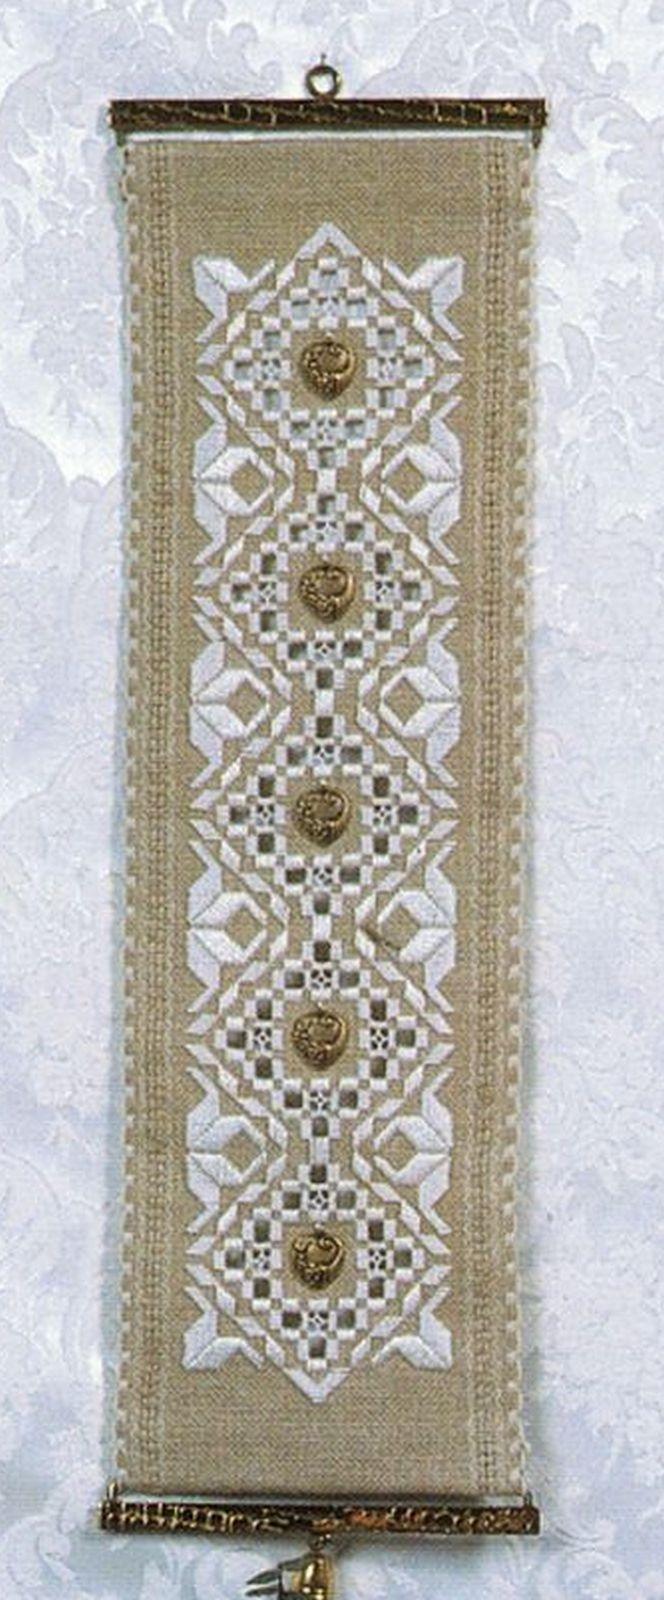 I Love Autumn Hardanger Embroidery Seasonal Sampler Rosalyn Watnemo Book image 5